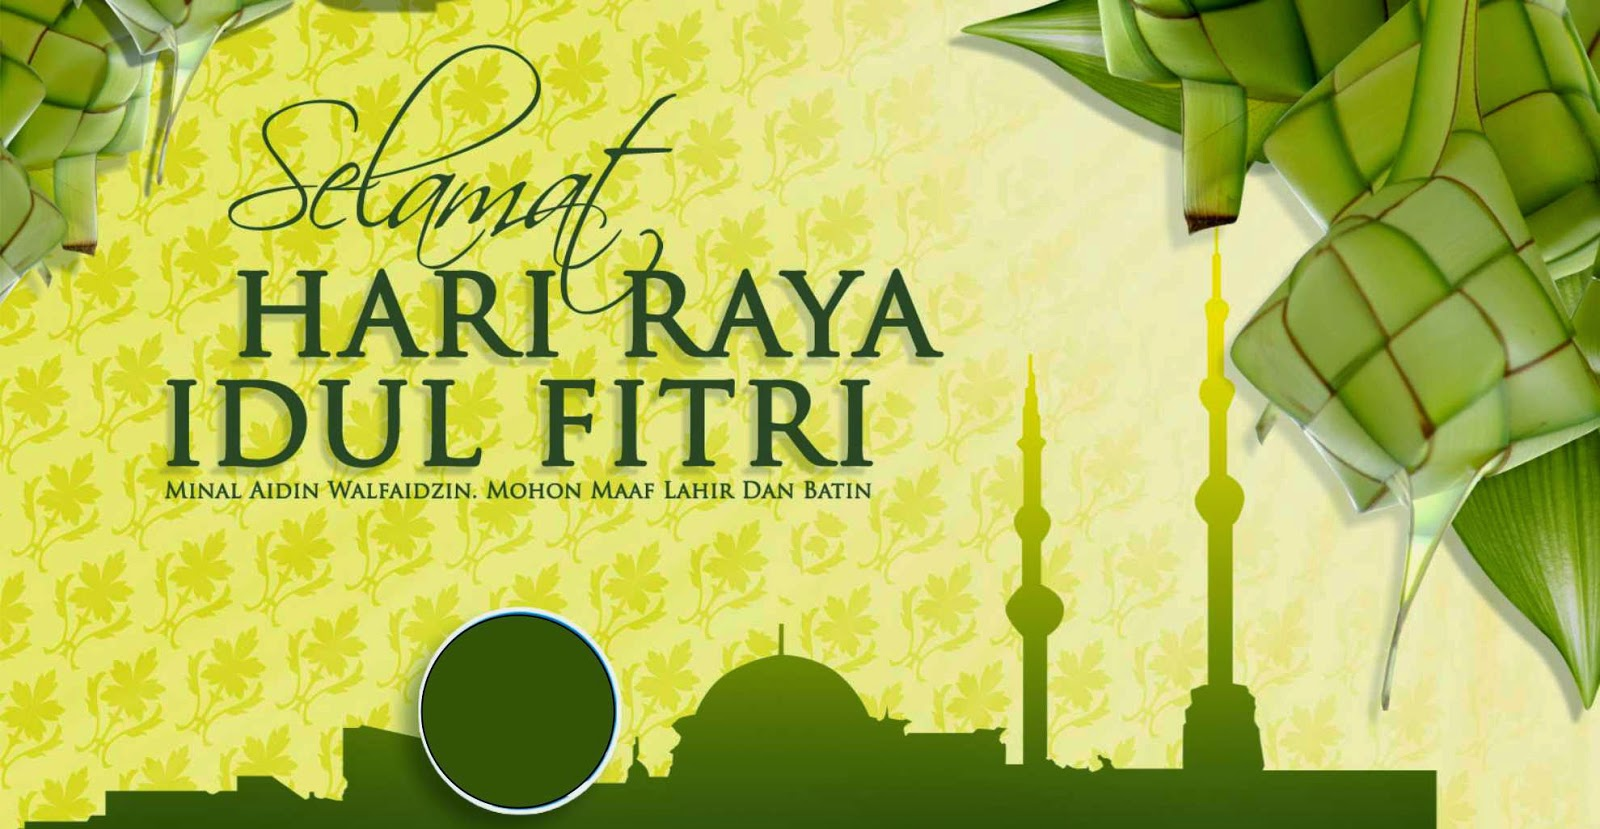 Ucapan Idul Fitri 2018